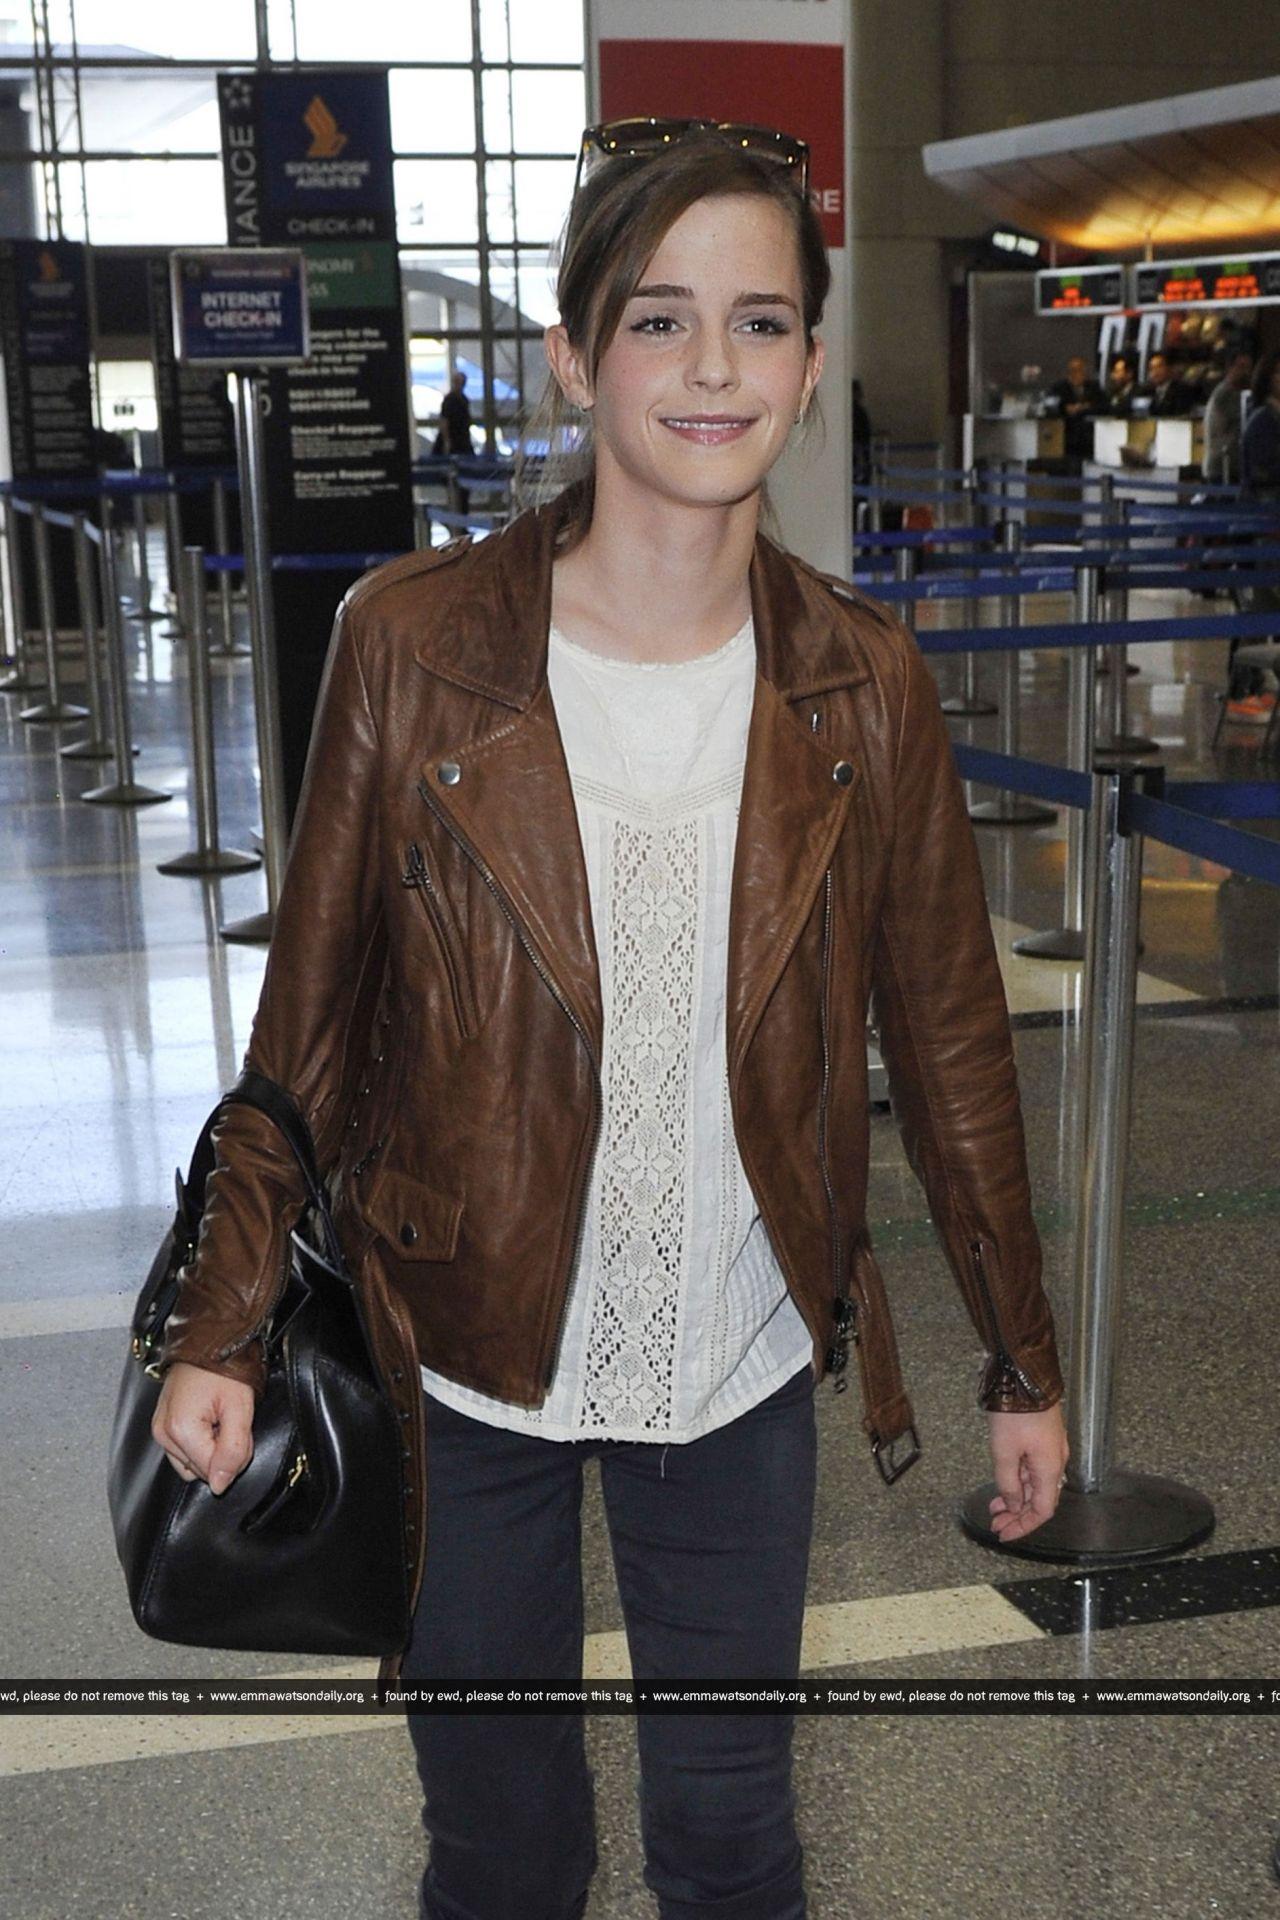 Kim Kardashian Hd Wallpaper Emma Watson Street Style At Lax Airport October 2013